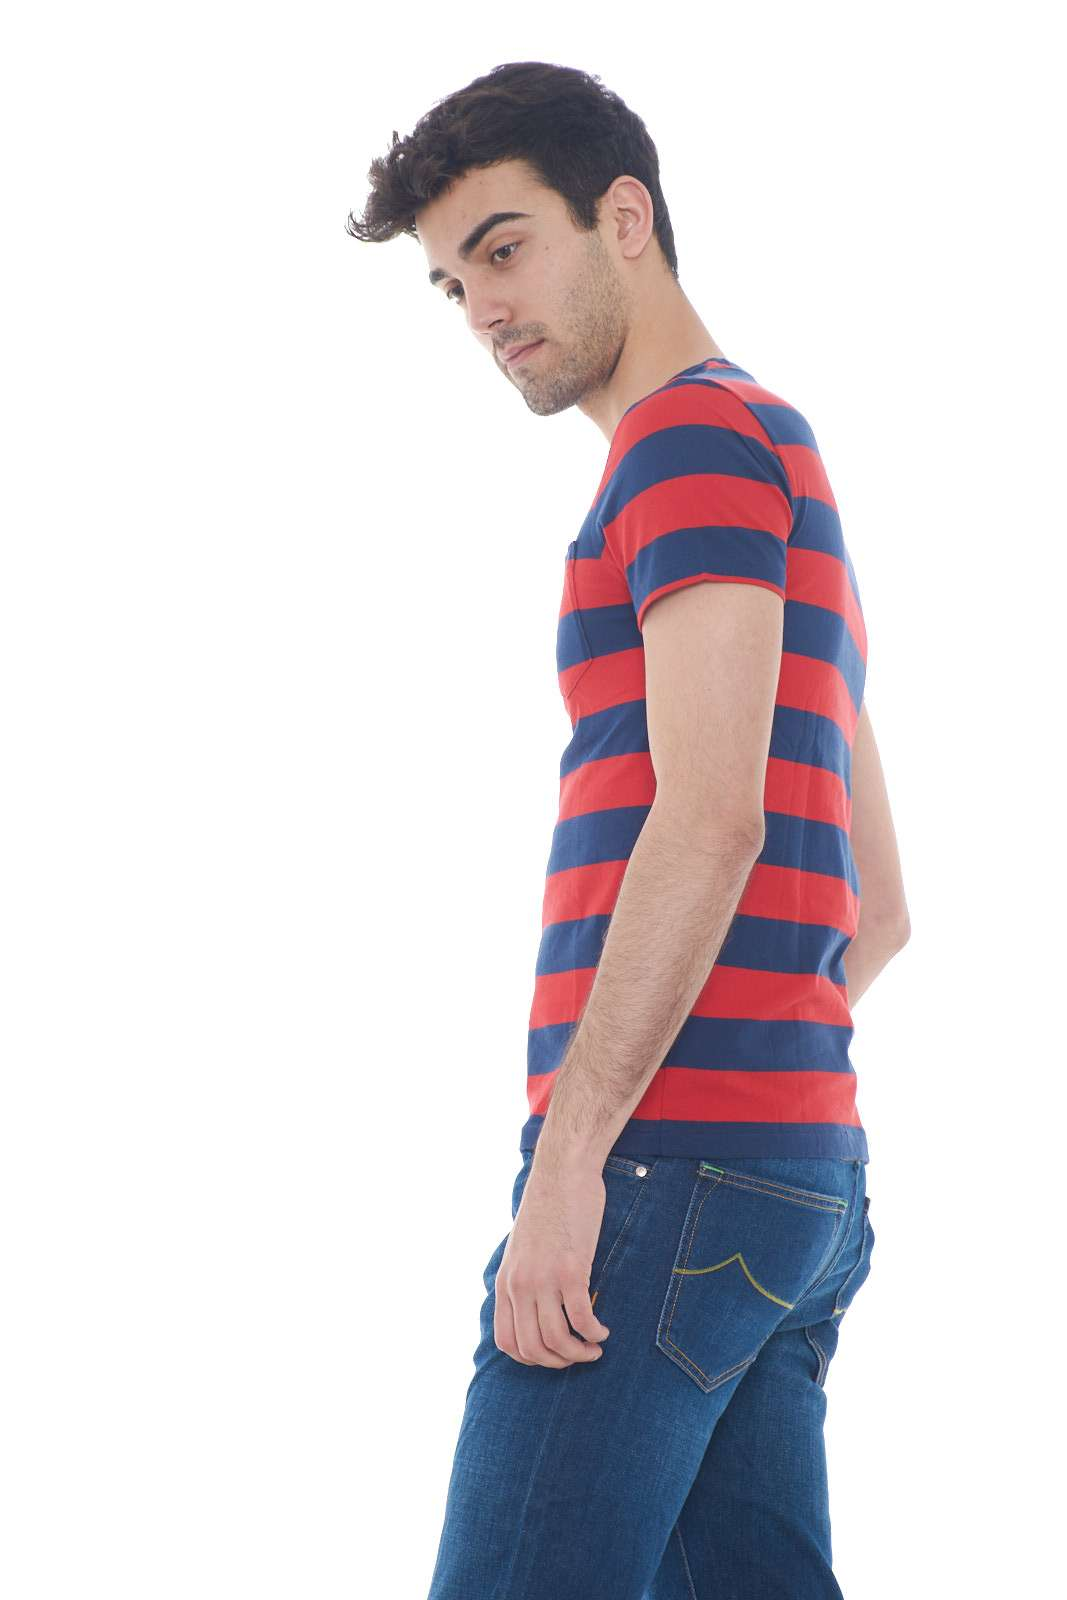 https://www.parmax.com/media/catalog/product/a/i/PE-outlet_parmax-t-shirt-uomo-Raph-Lauren-710740882-B.jpg